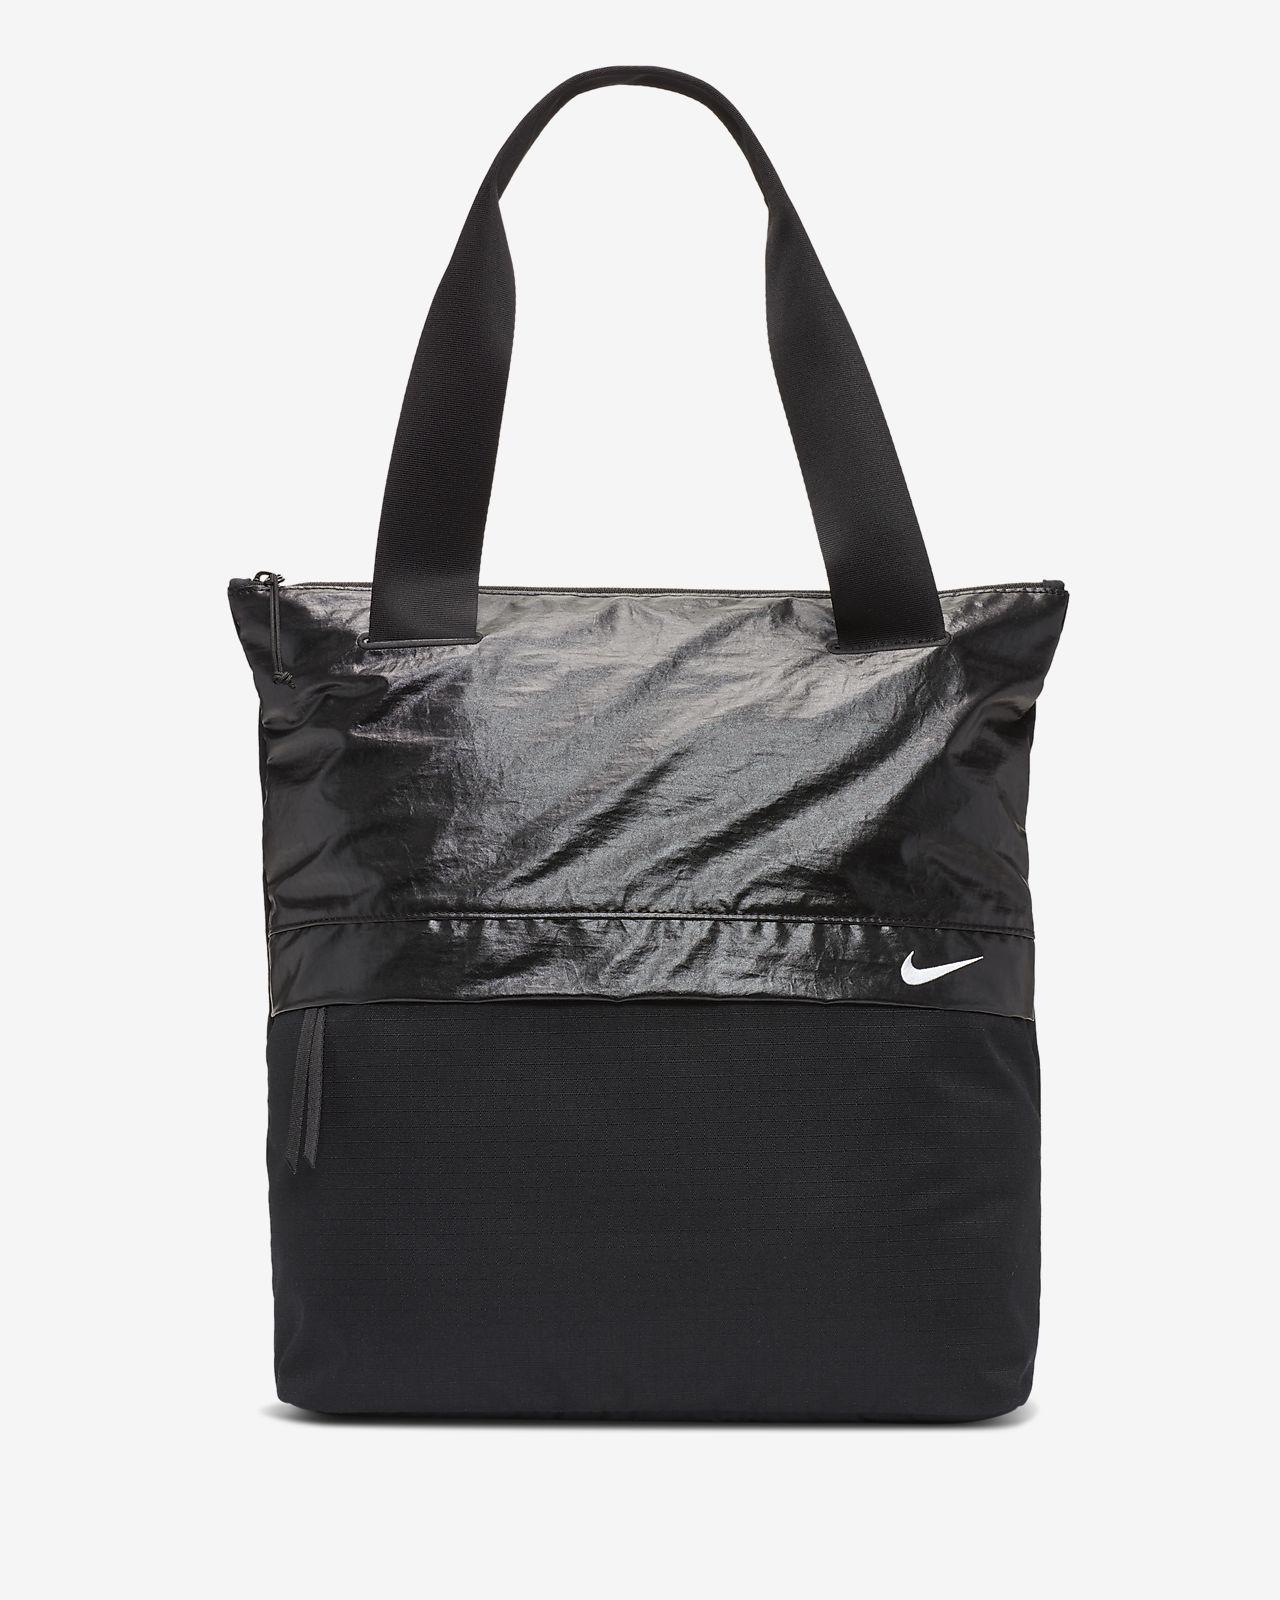 Tote bag de training Nike Radiate 2.0 pour Femme